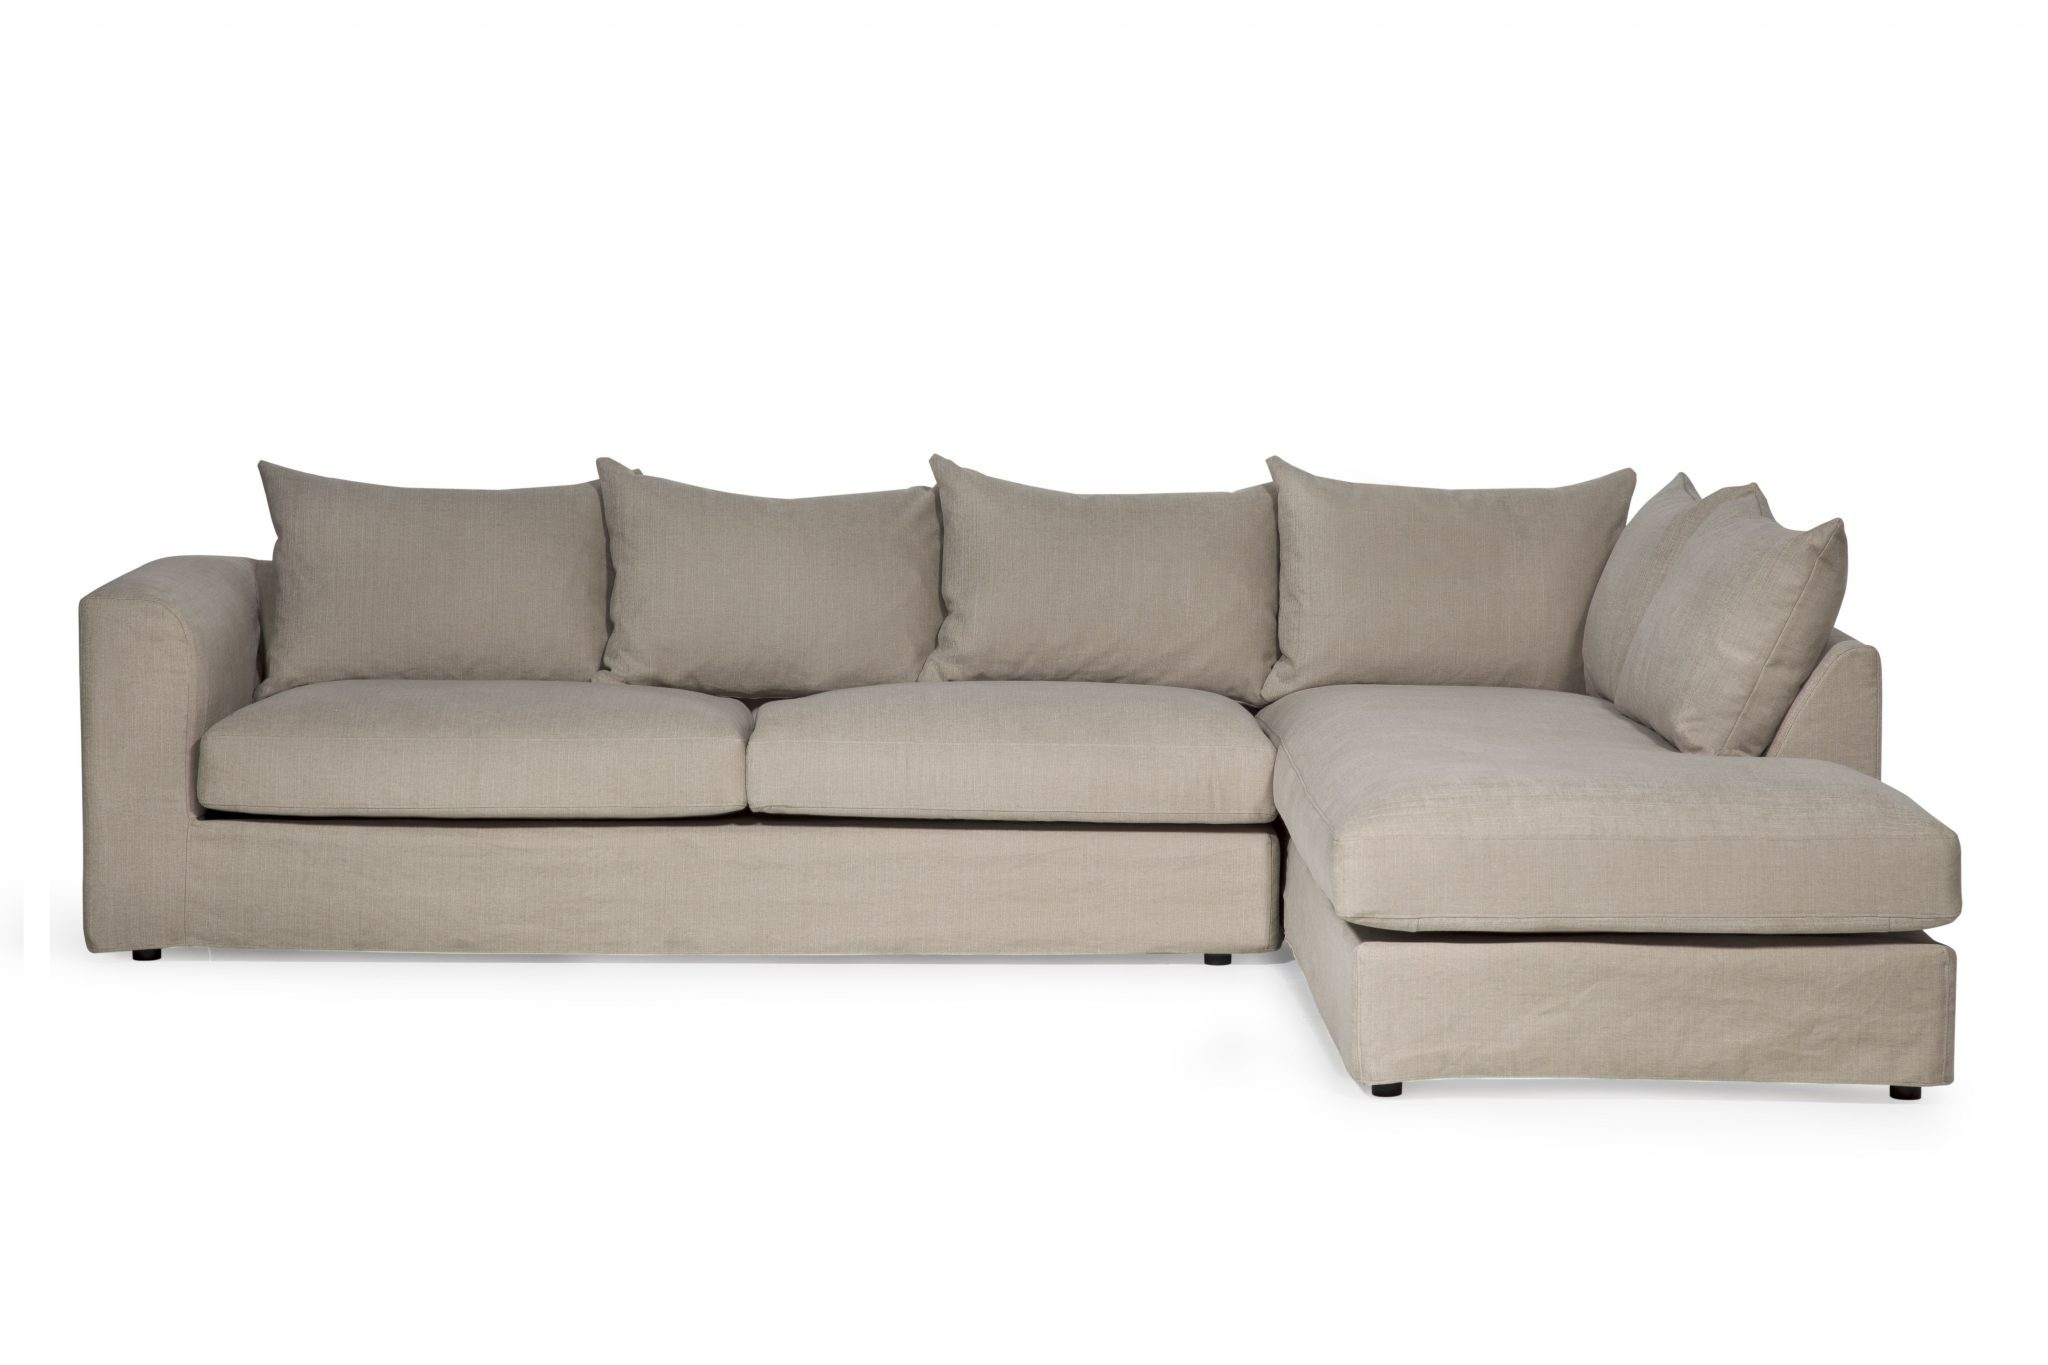 danish style sofa australia stylish sofas uk ltd portland 3 seater online in